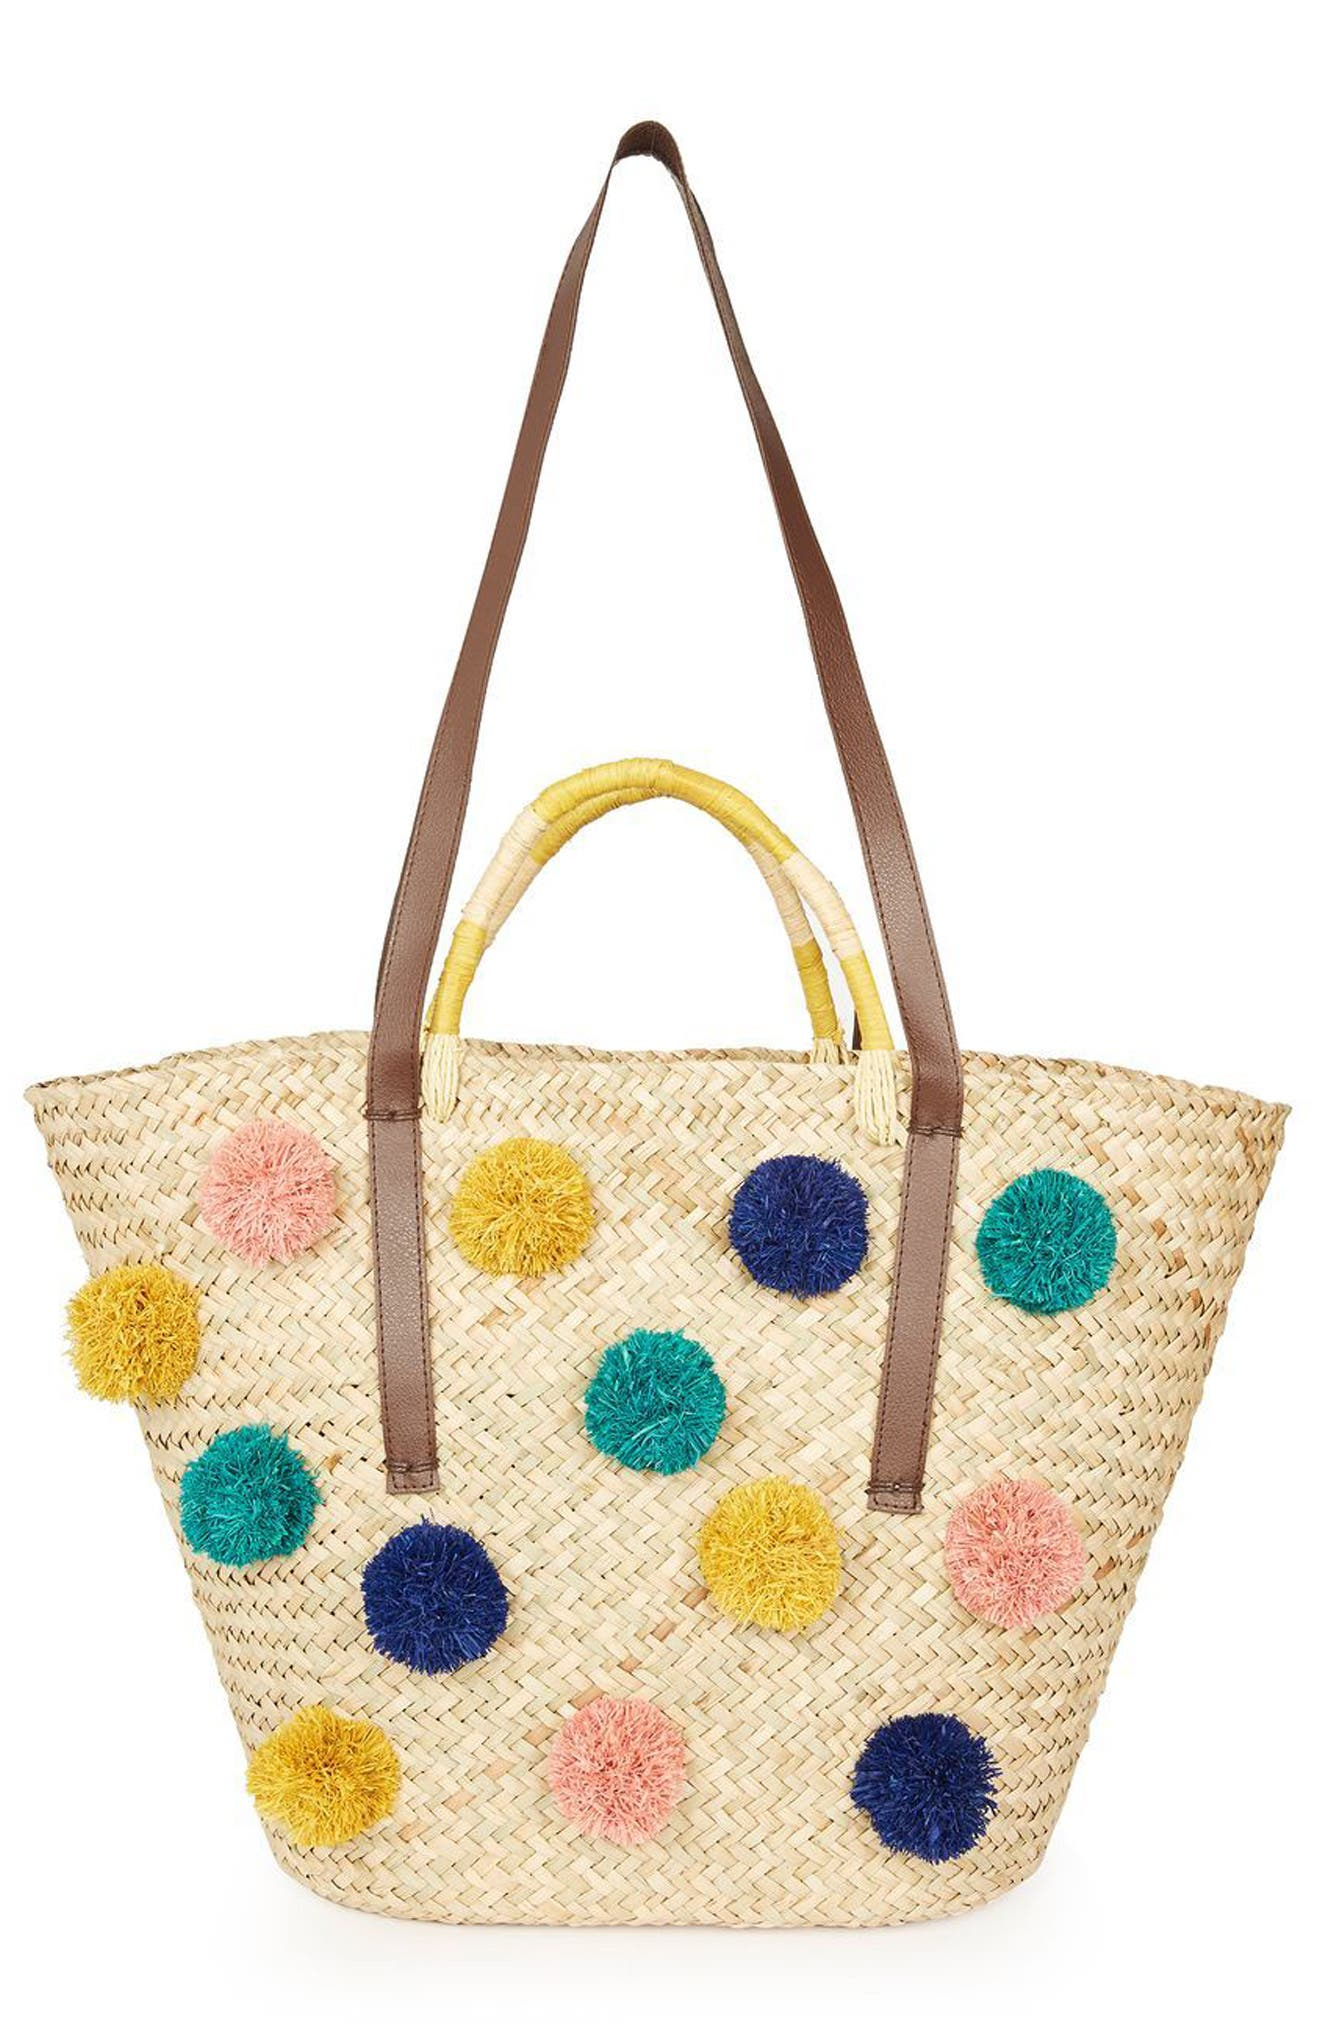 Topshop Pompom Straw Tote Bag